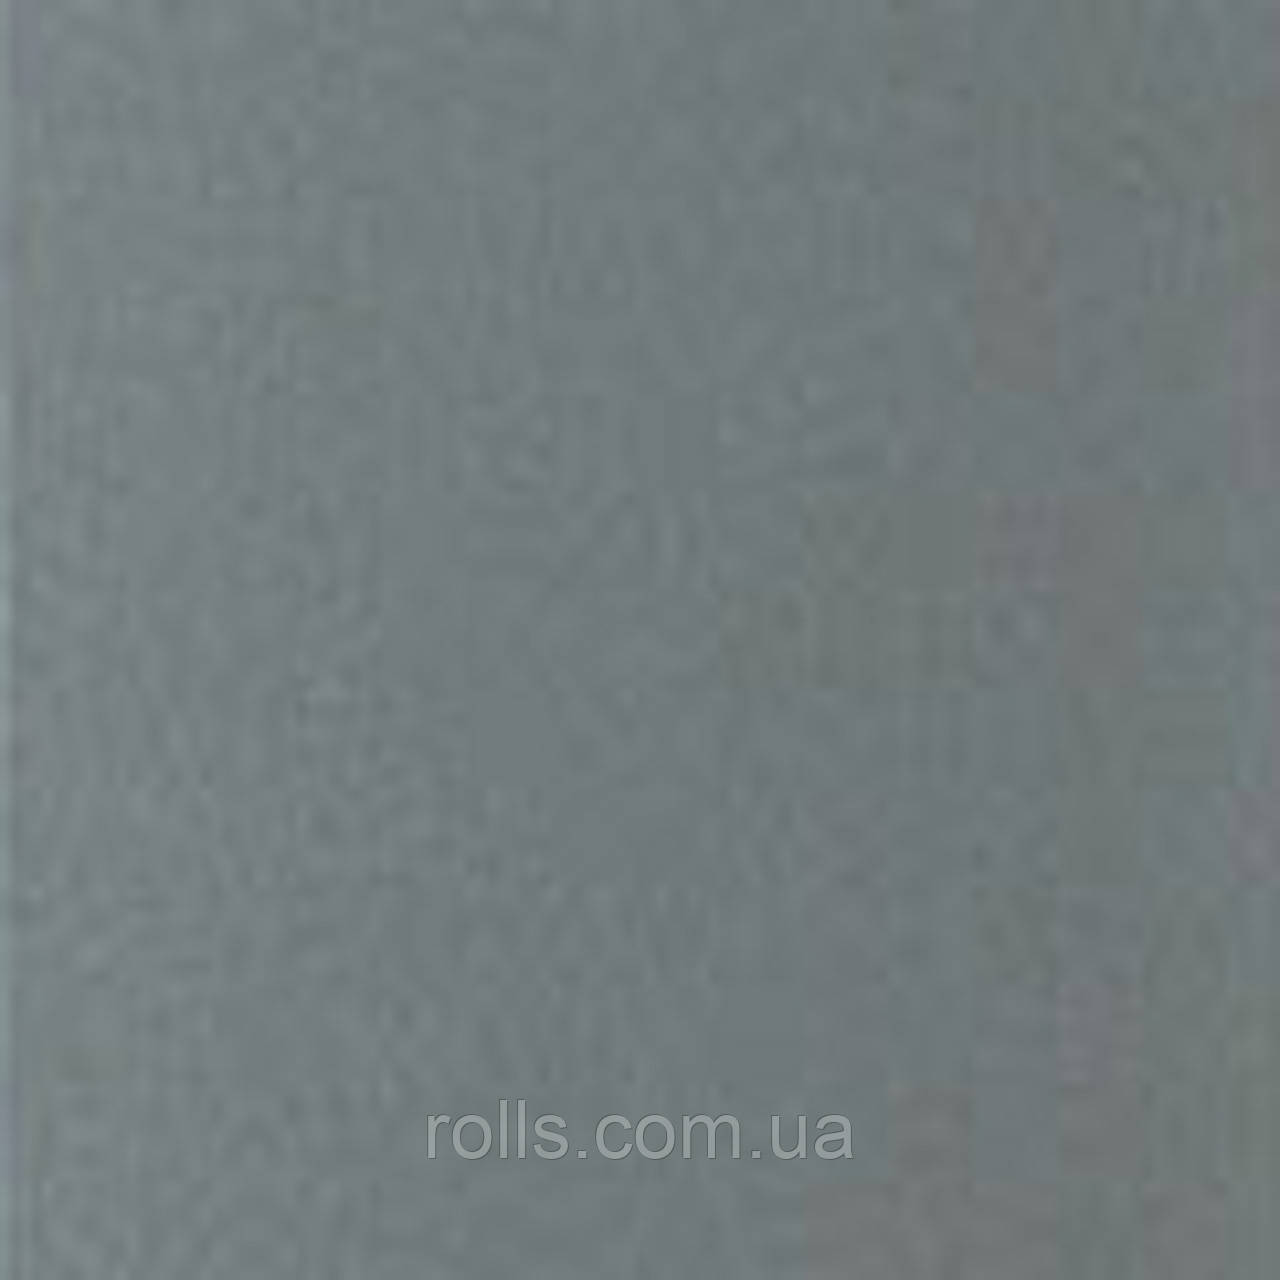 "Лист плоский алюминиевый Prefalz P.10 №07 HELLGRAU ""Светло-серый"" RAL7005 ""LIGHT GRAY"" 0,7х1000х2000мм"